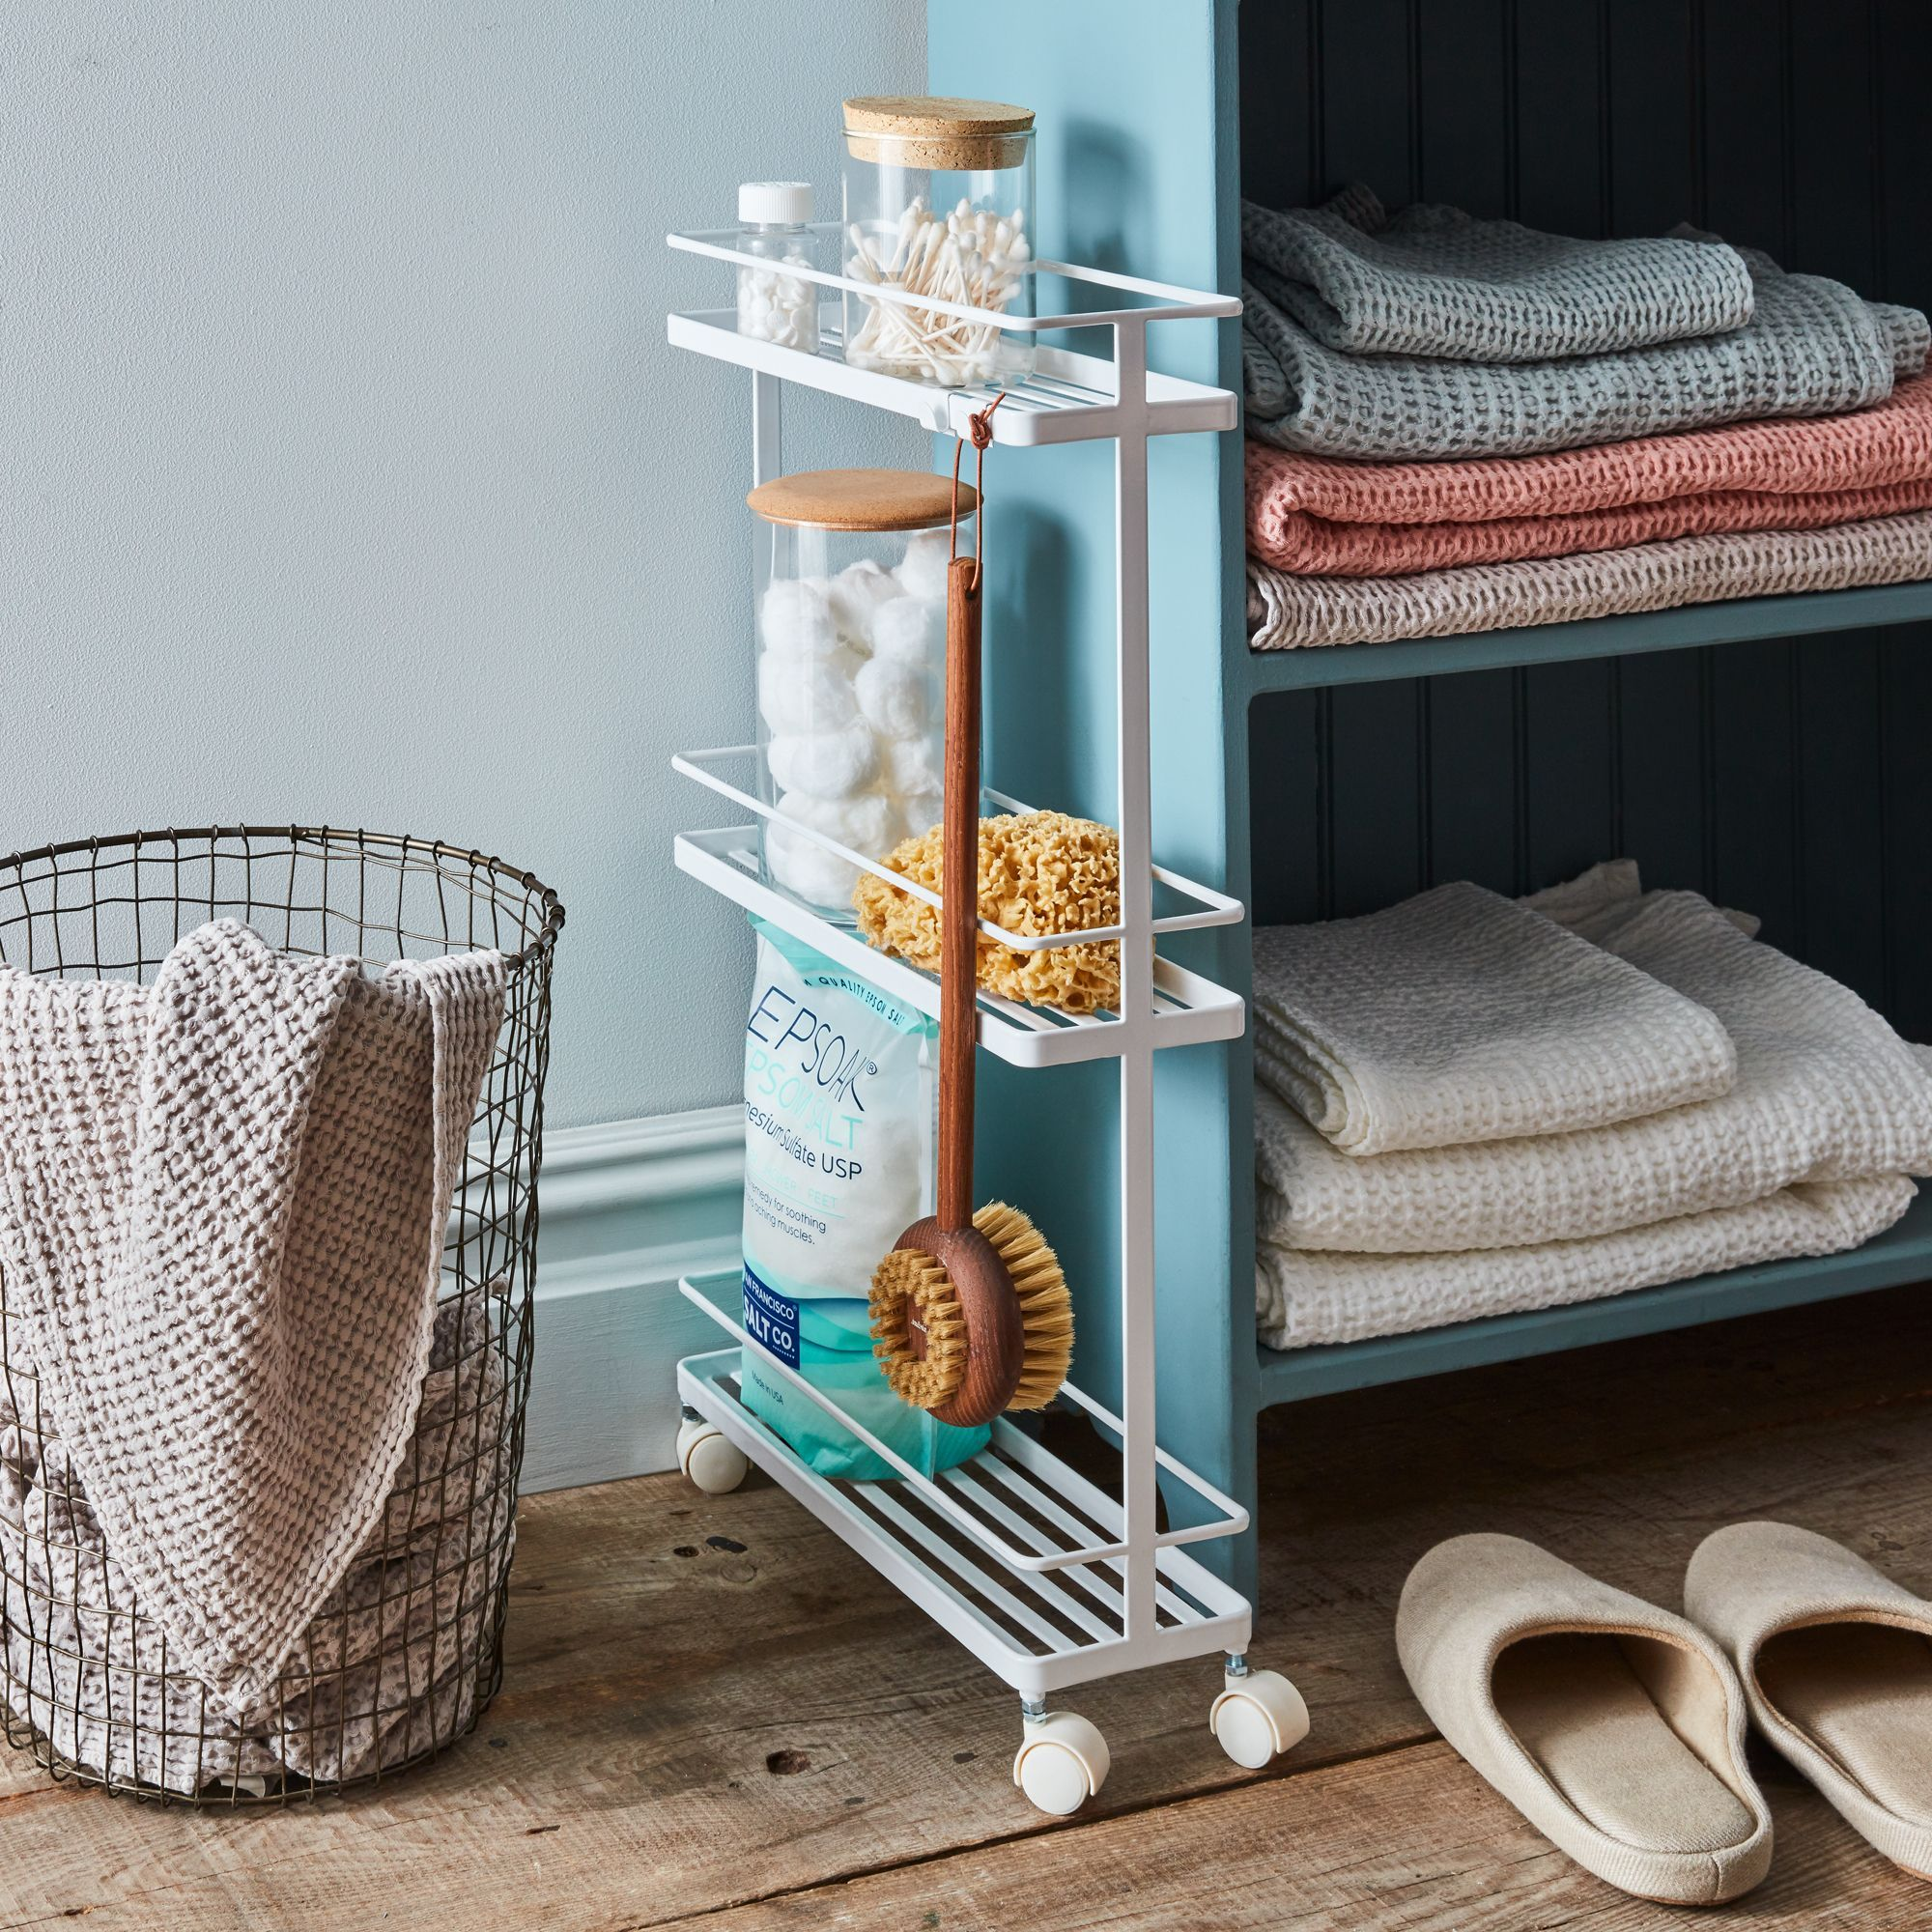 20 Laundry Room Organization Ideas Best Laundry Organizers